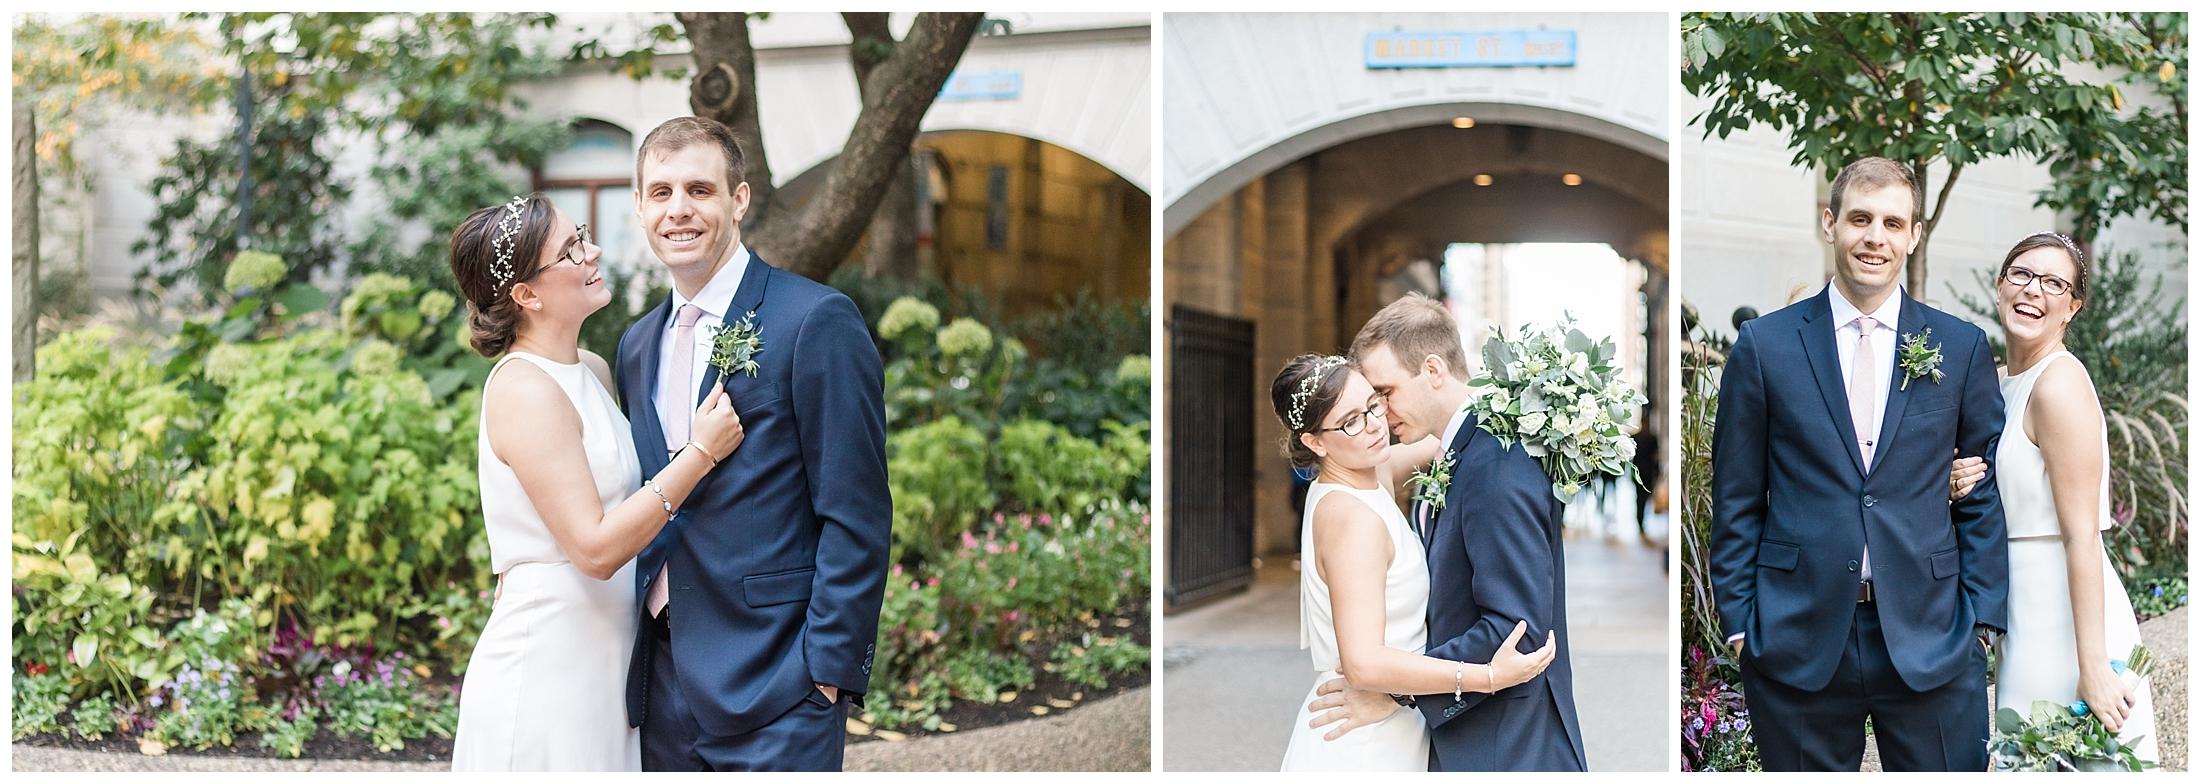 Philadelphia-Wedding-Brewery-Wedding-28.jpg